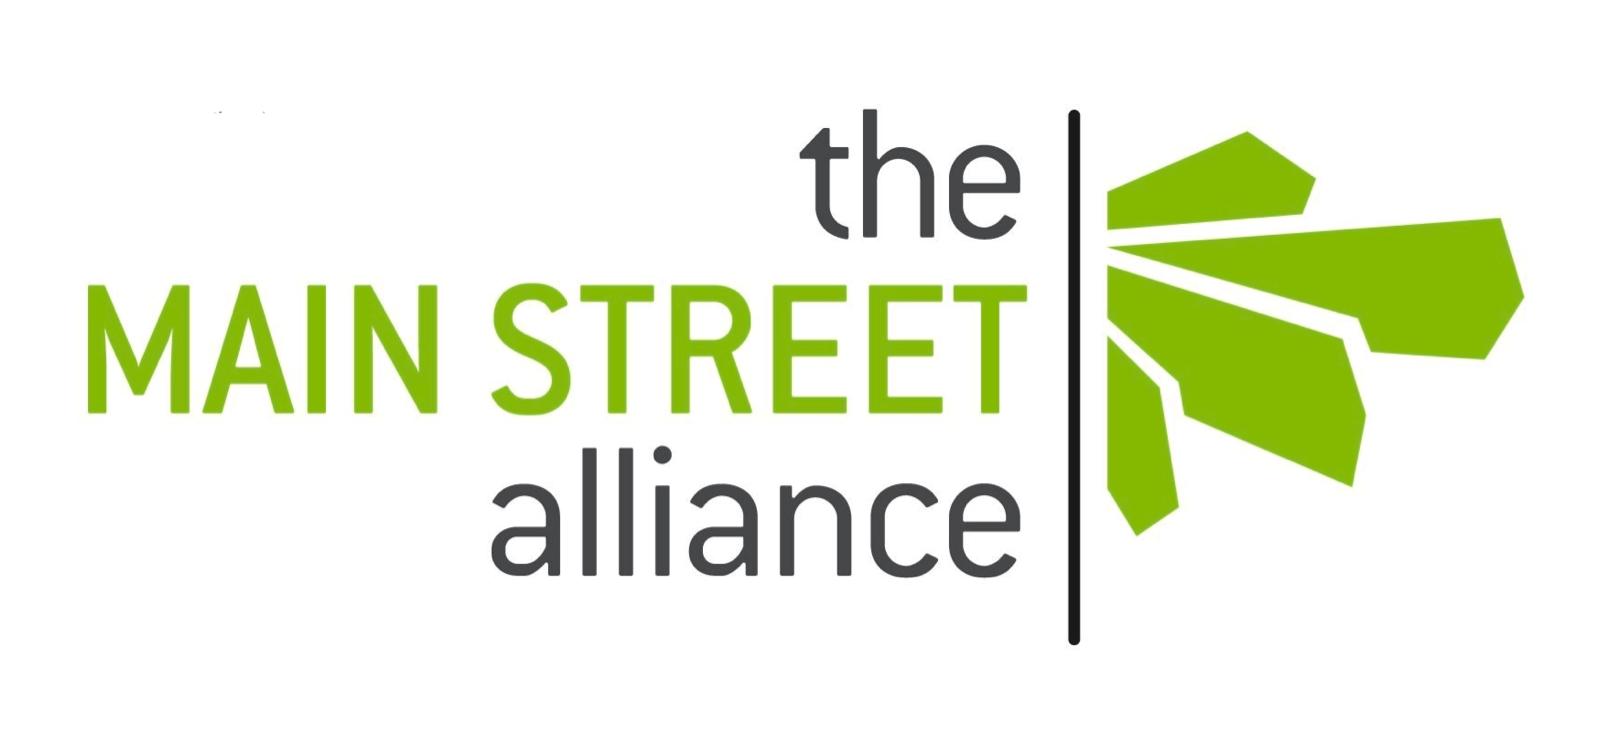 main_street_alliance_one_portland.png